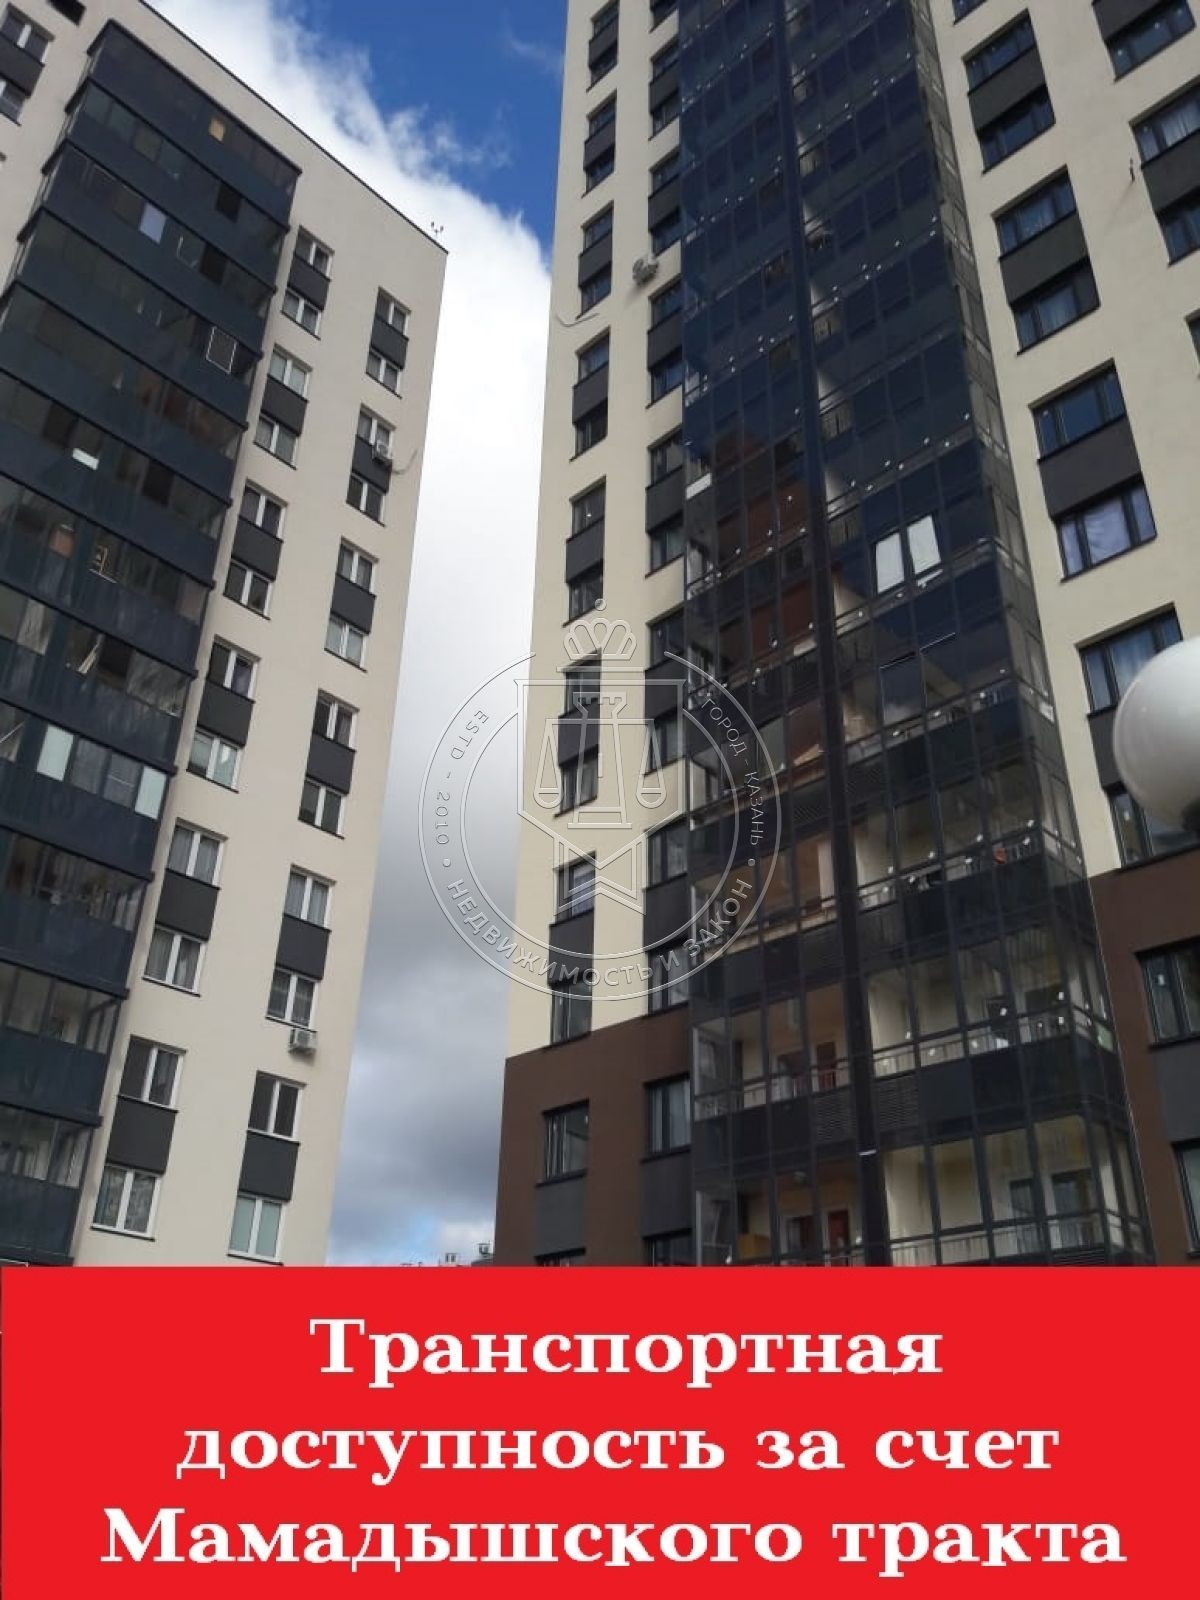 Продажа 3-к квартиры Натана Рахлина ул, 1-15-1